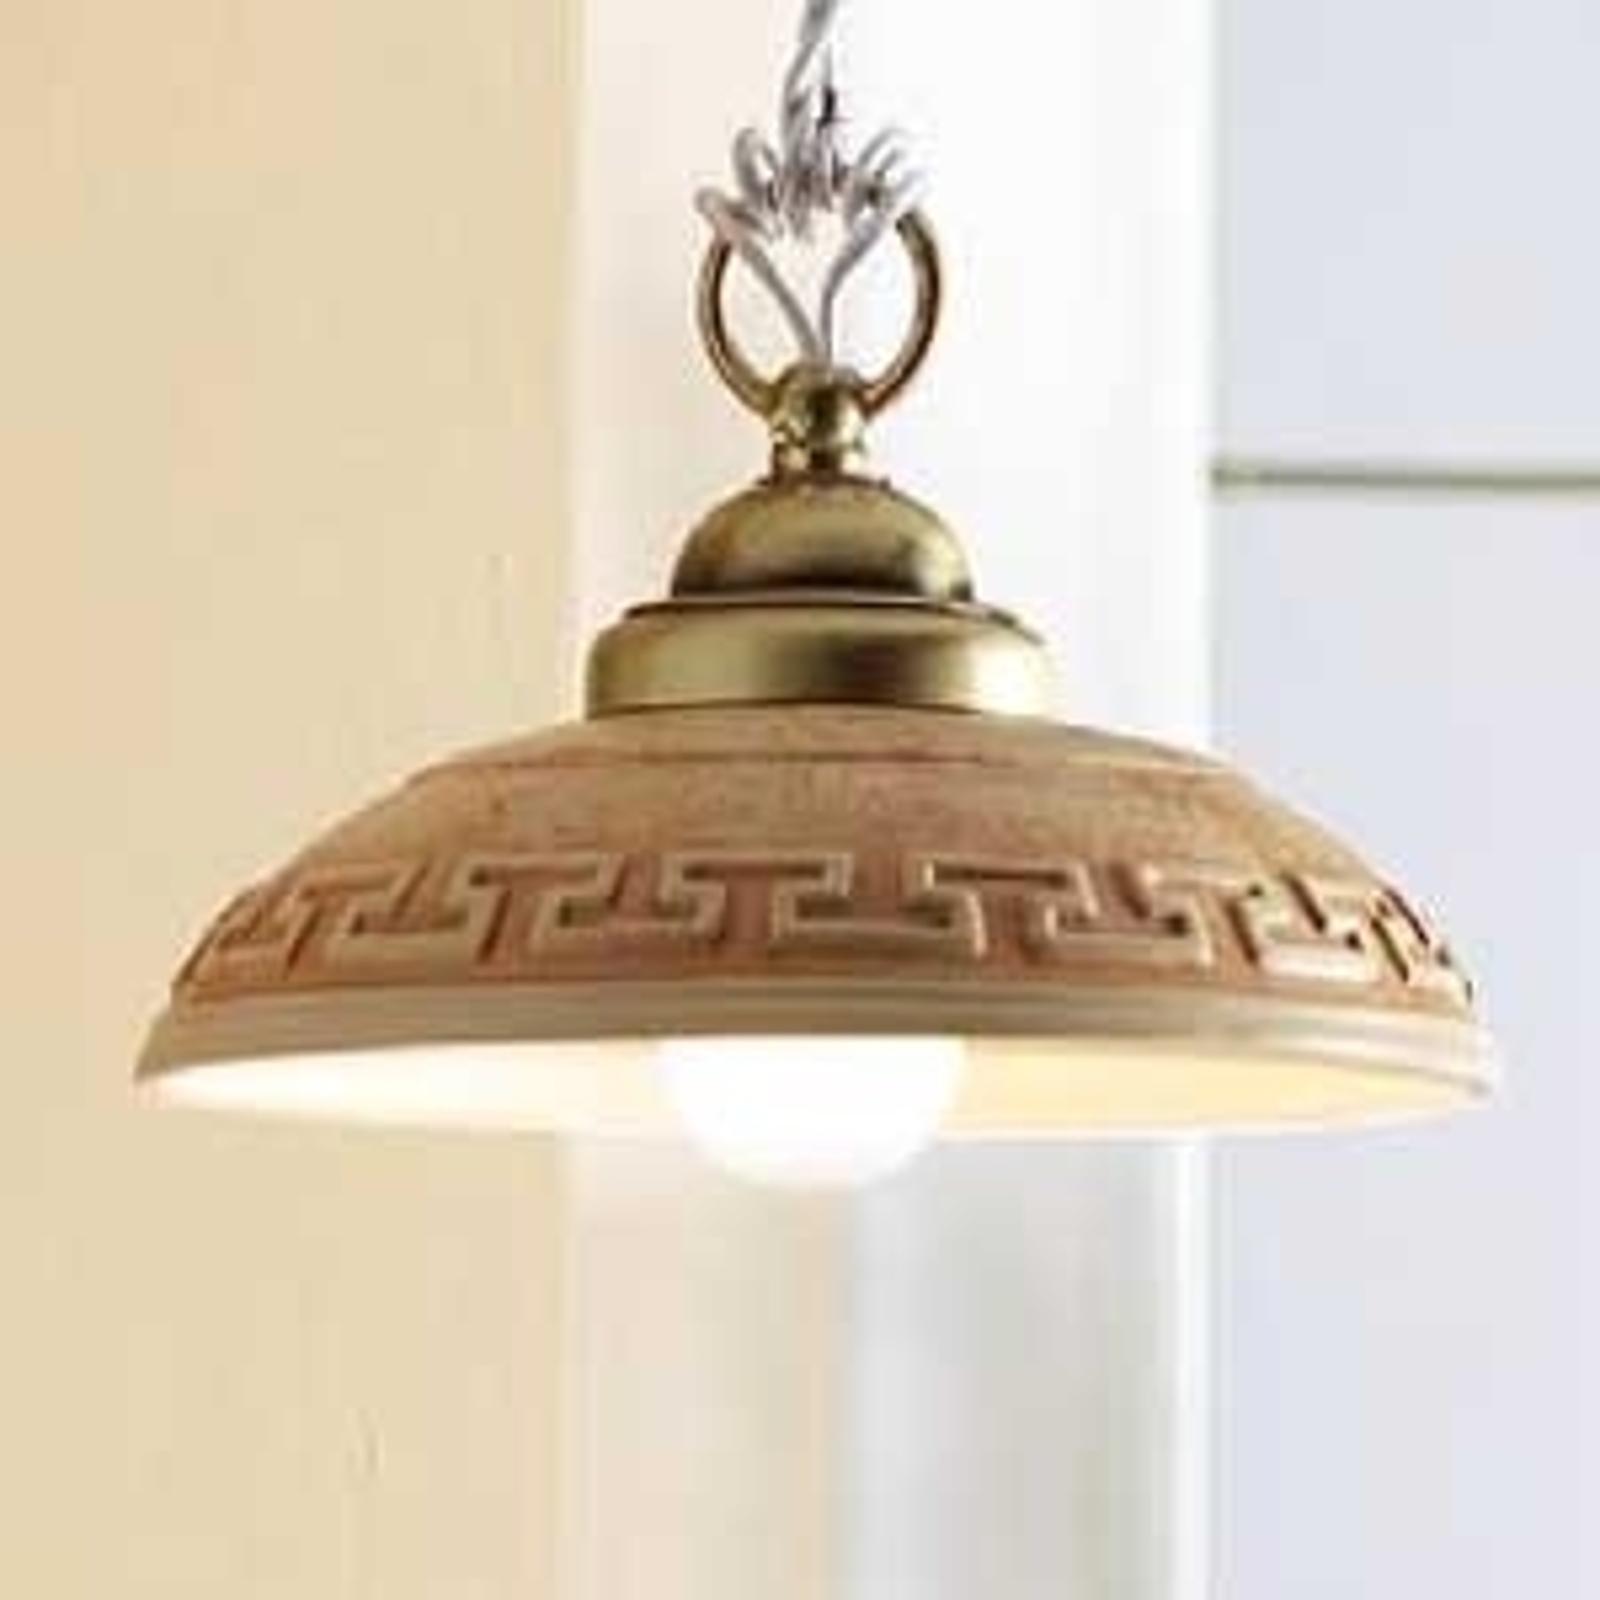 Hængelampe GRECA MEDITERRANEO